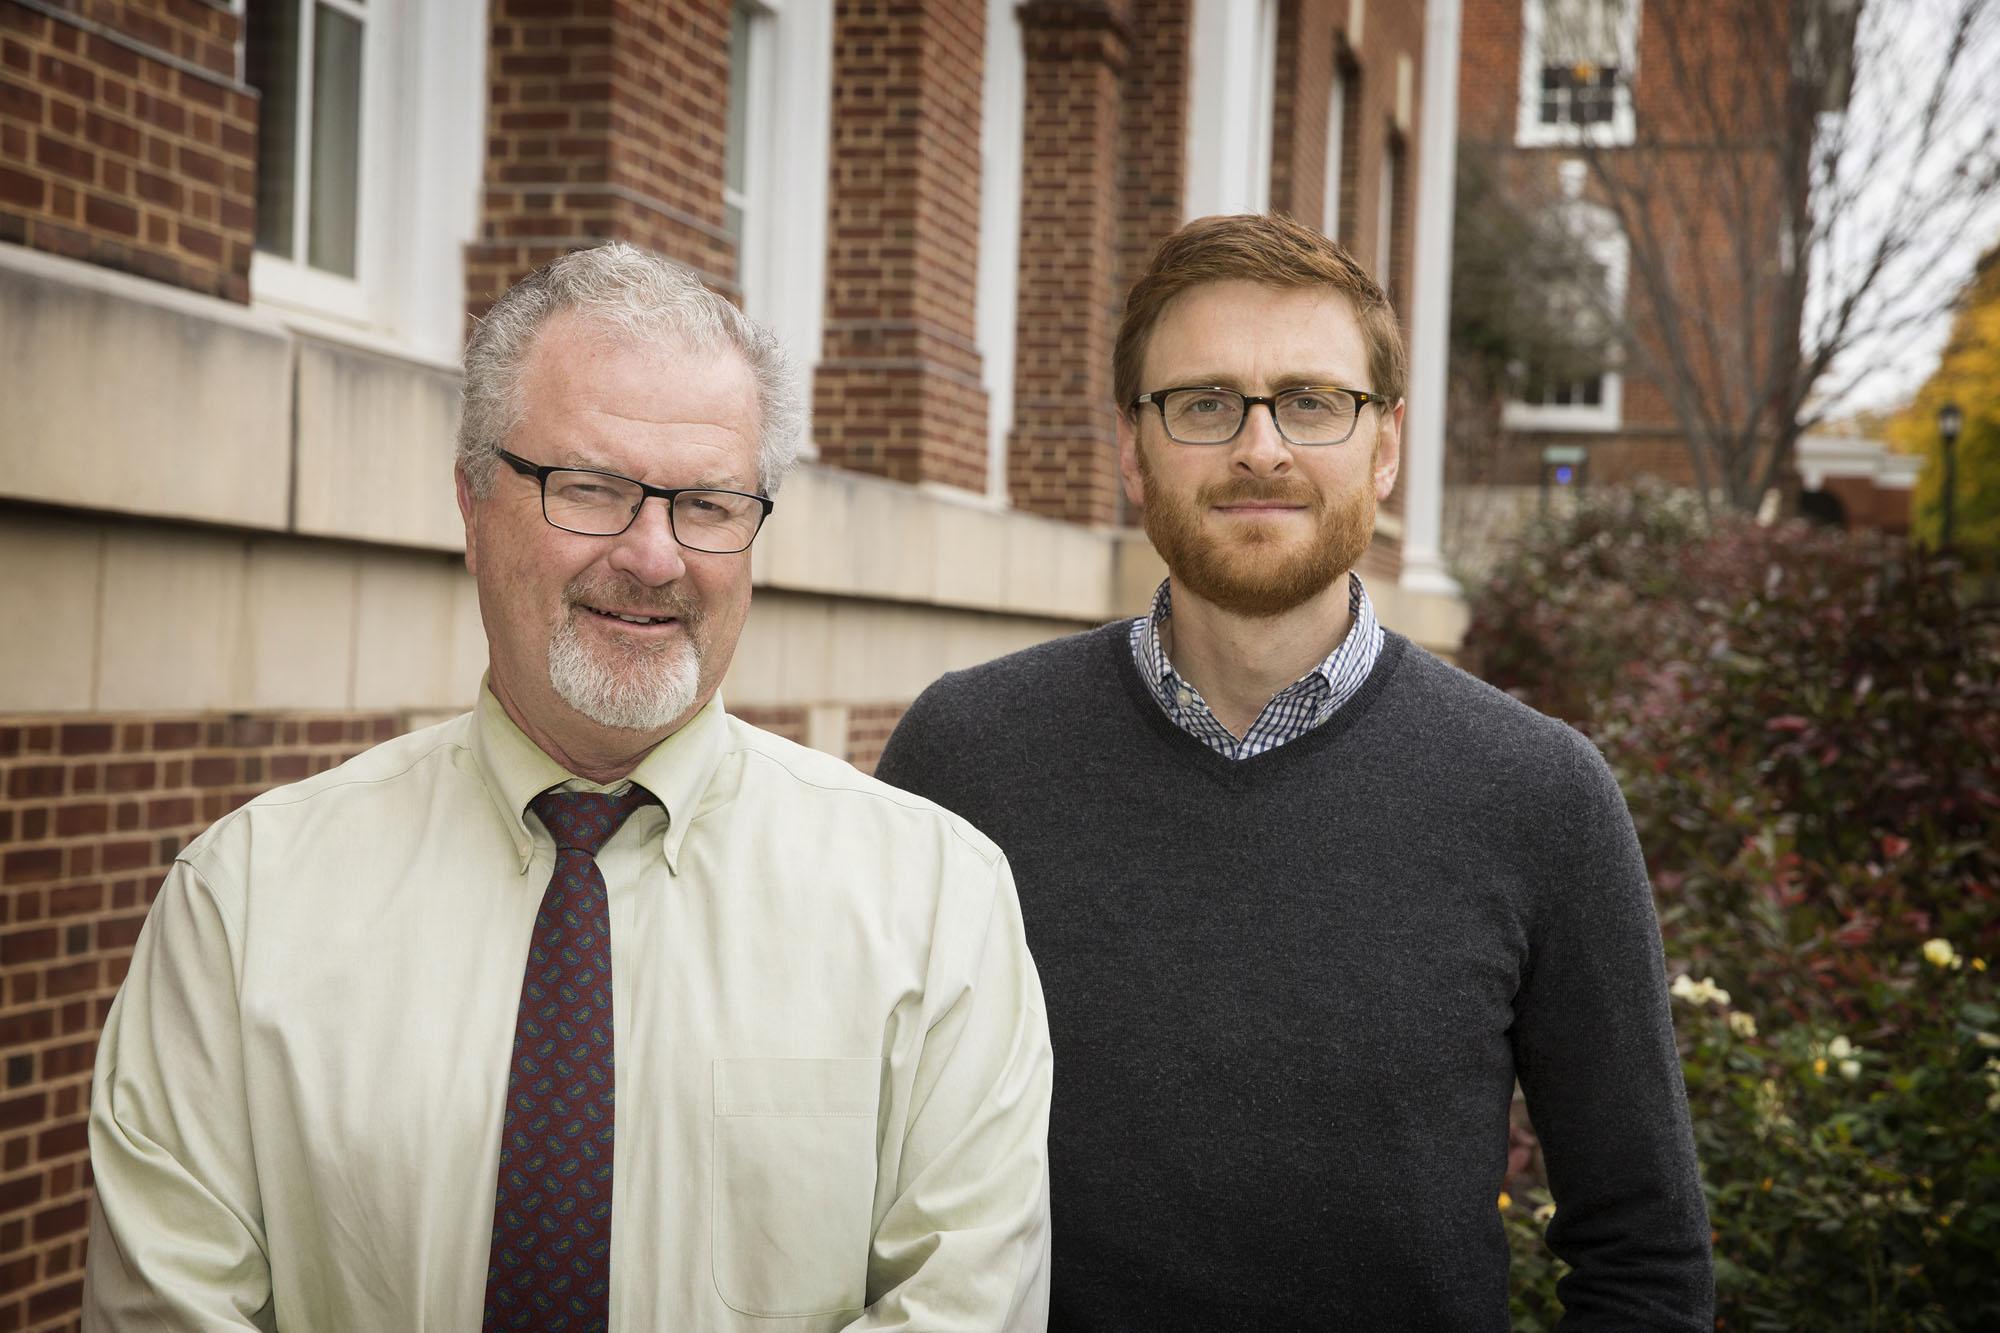 Researchers Kieran O'Connor, left, and Thomas Bateman, right.